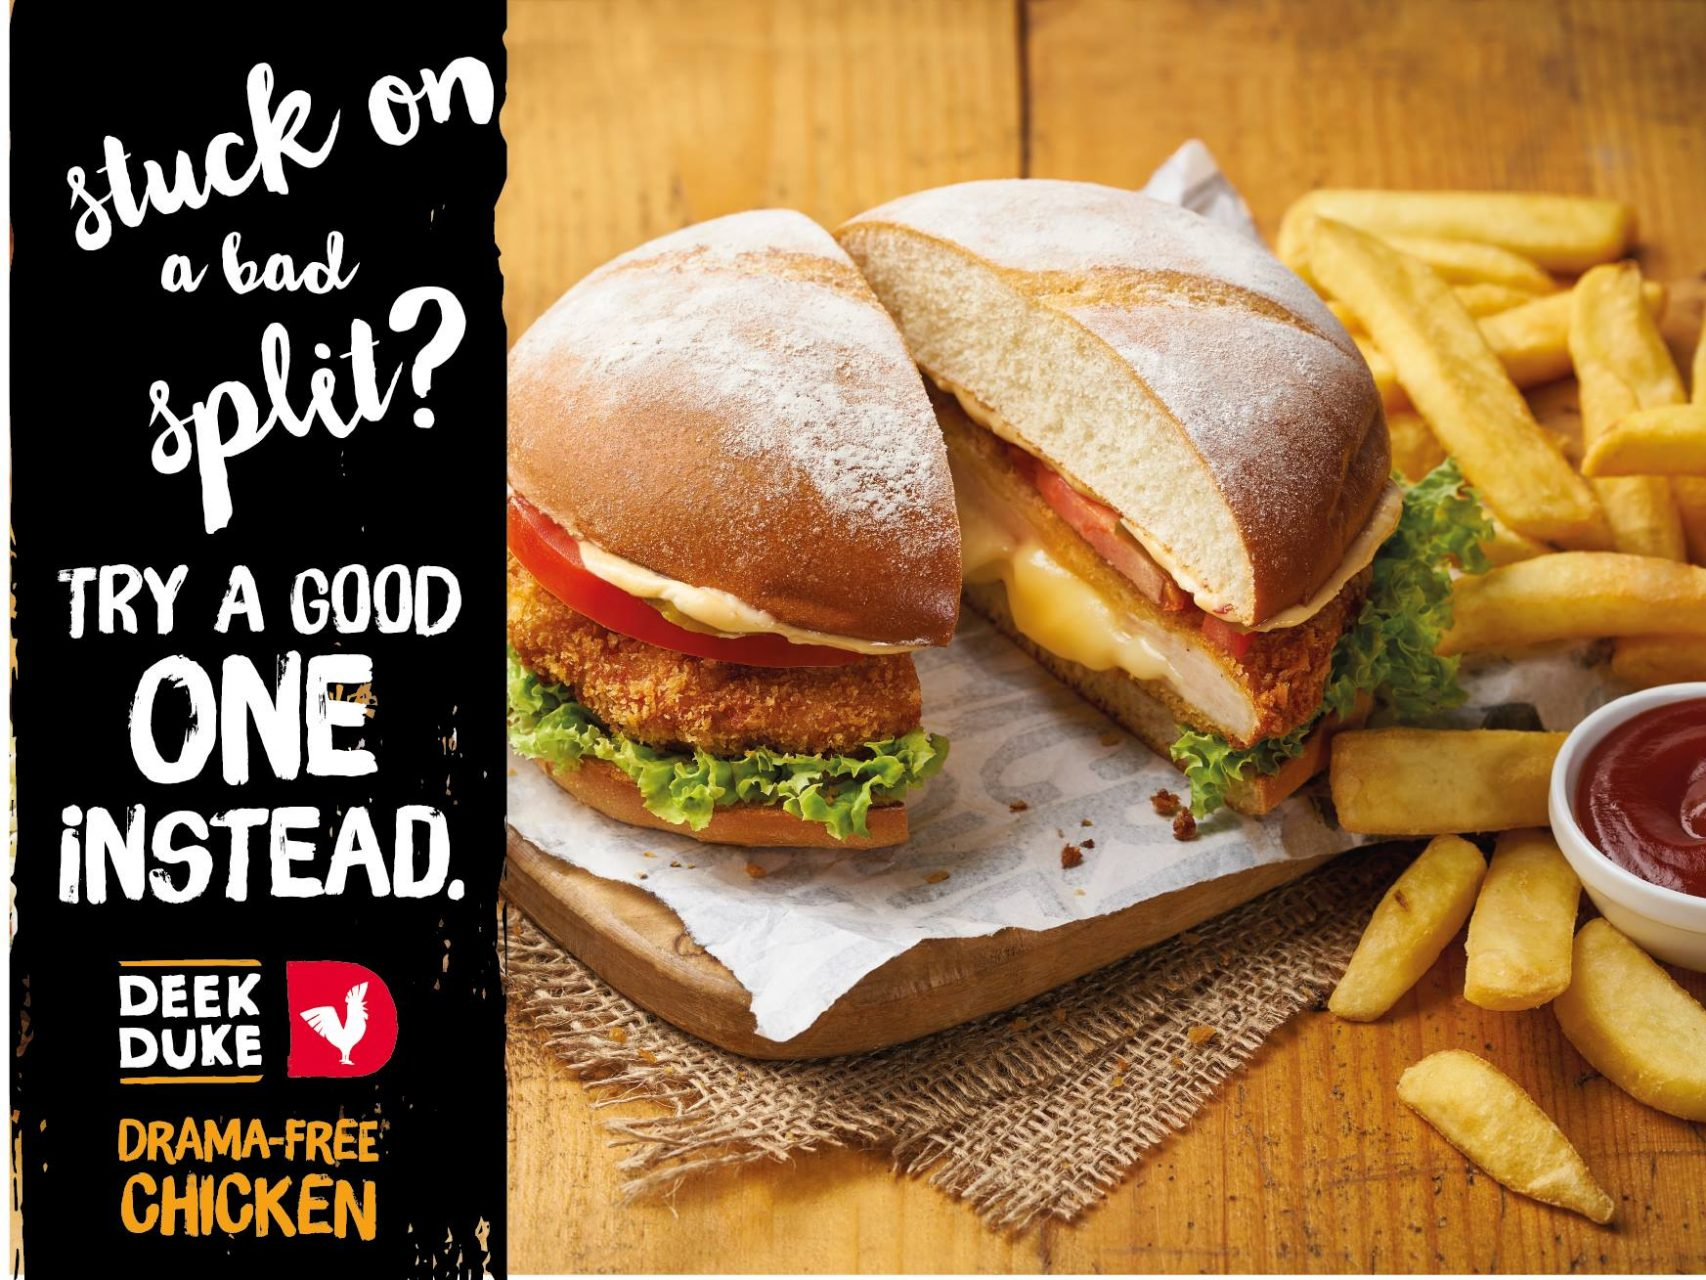 Deek duke burger food styling by Butter & Basil